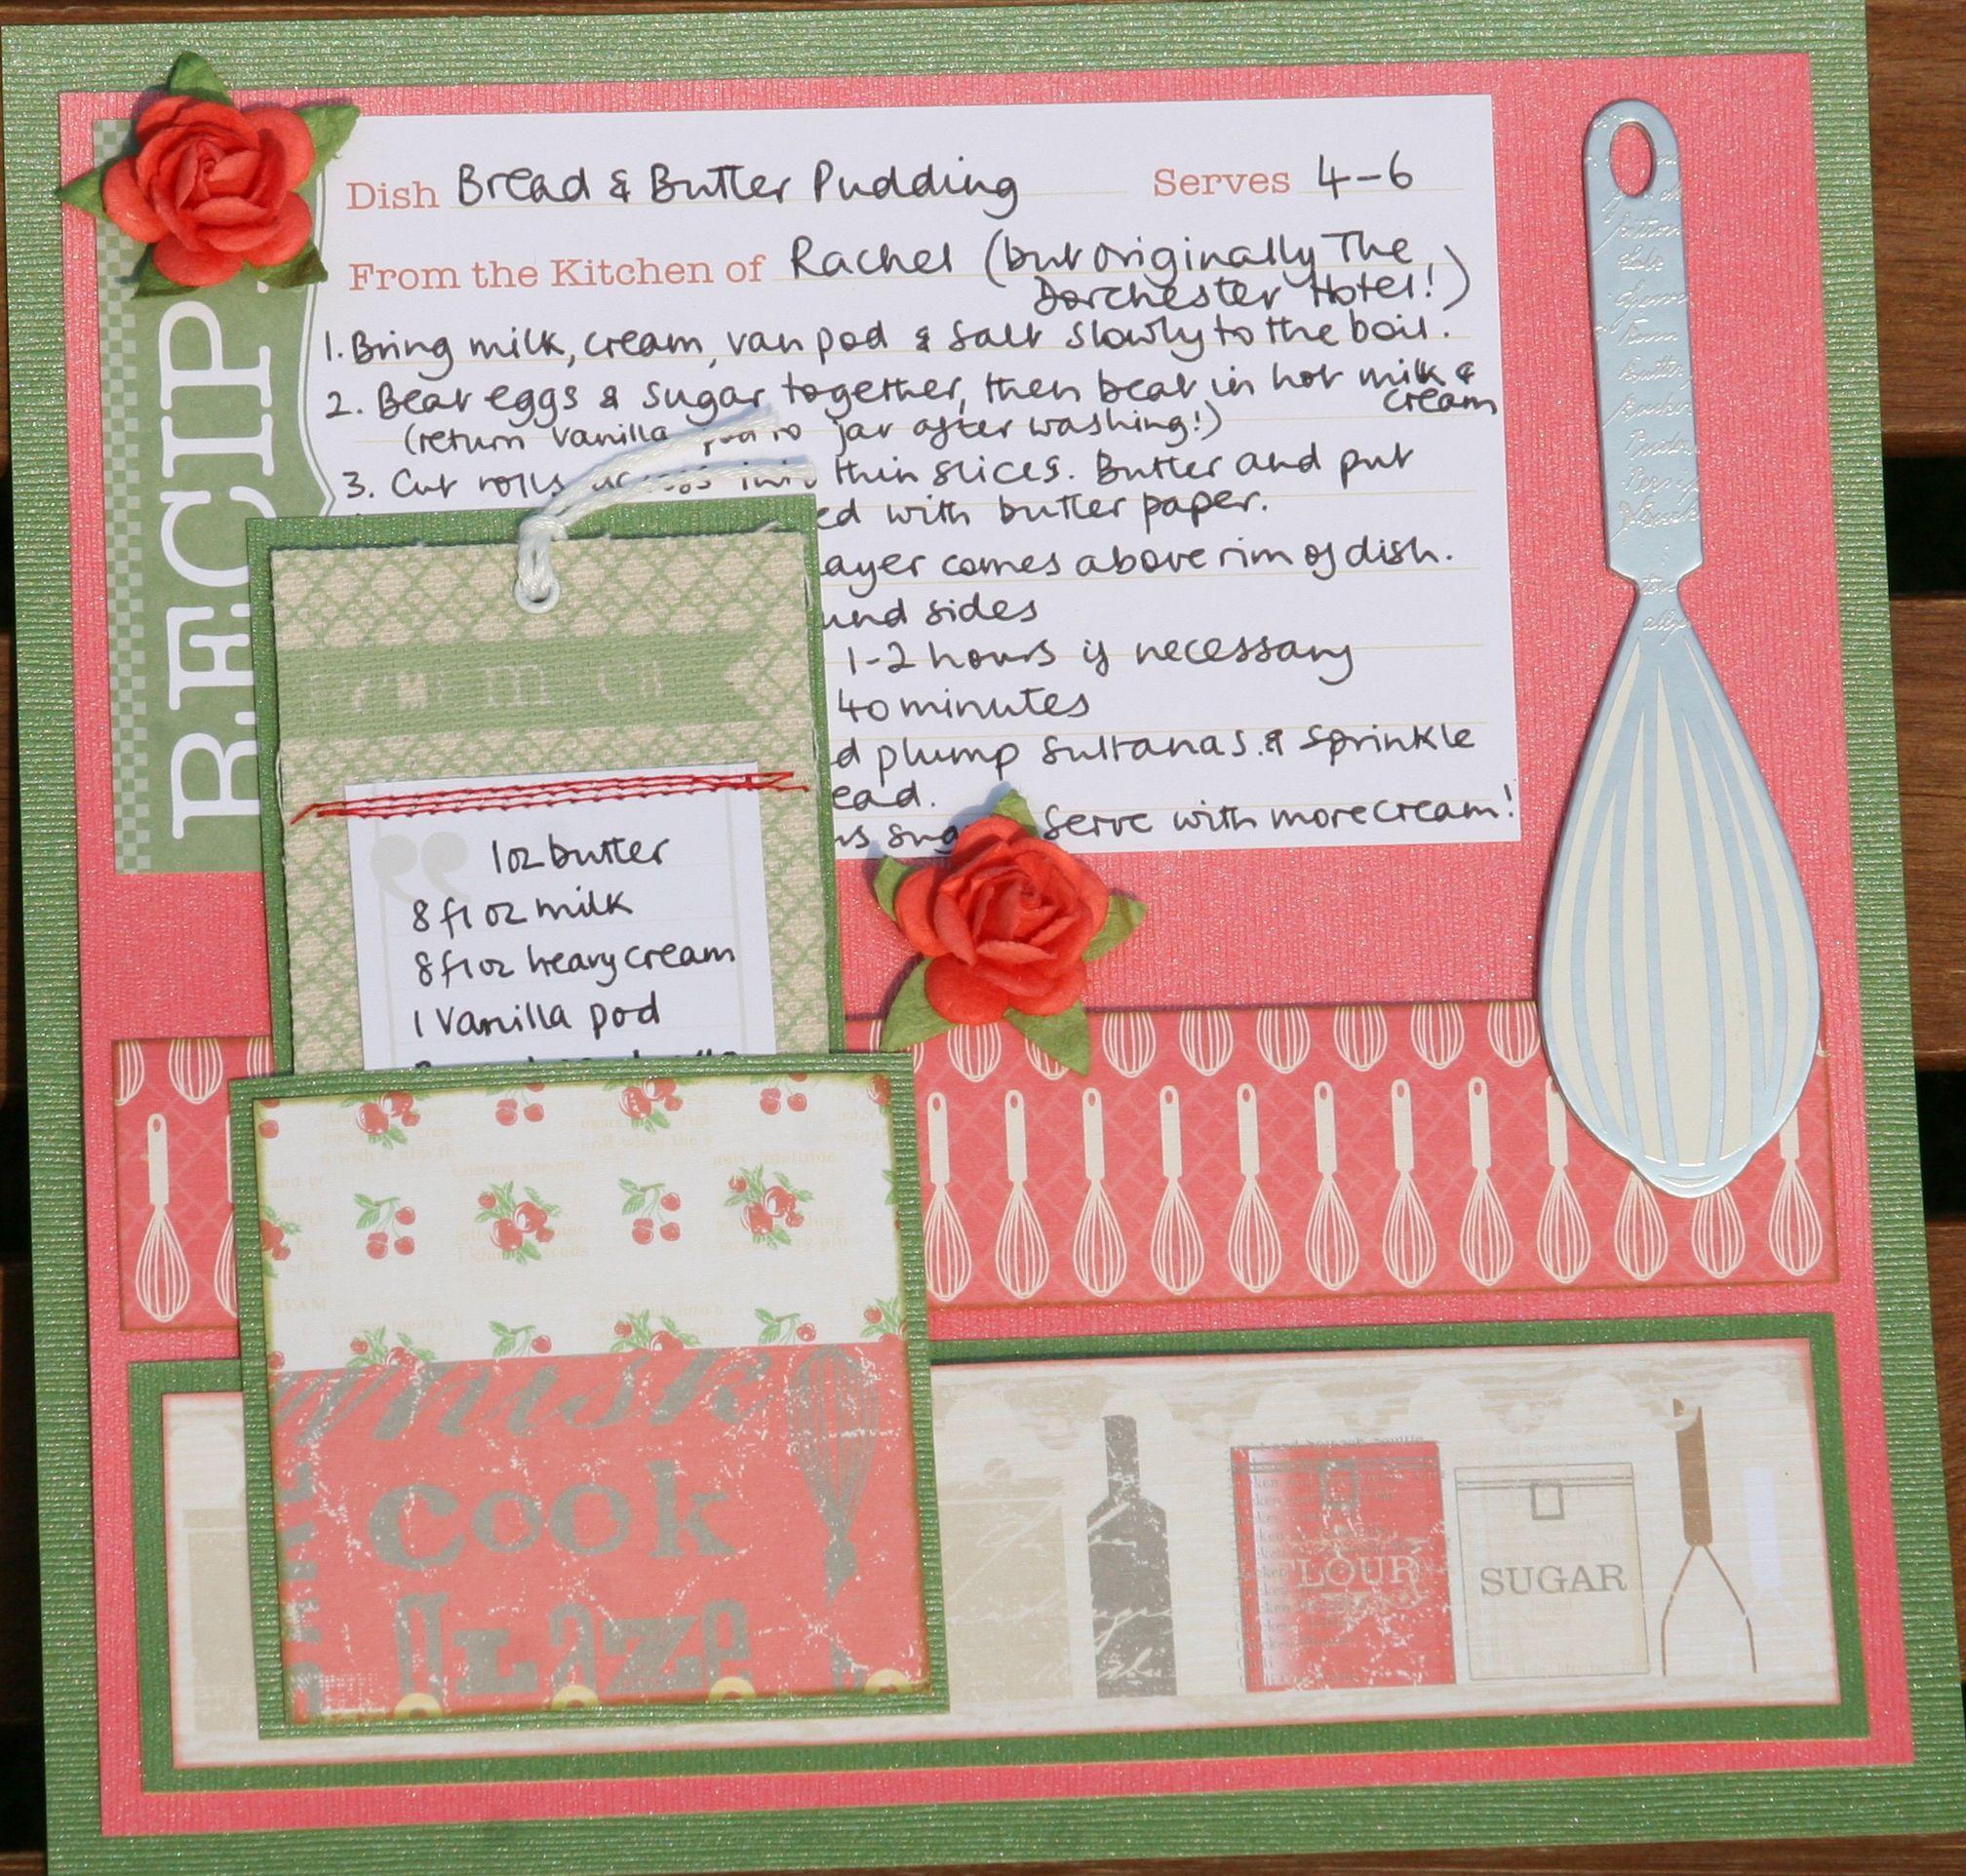 Bread & Butter pudding Scrapbook recipe